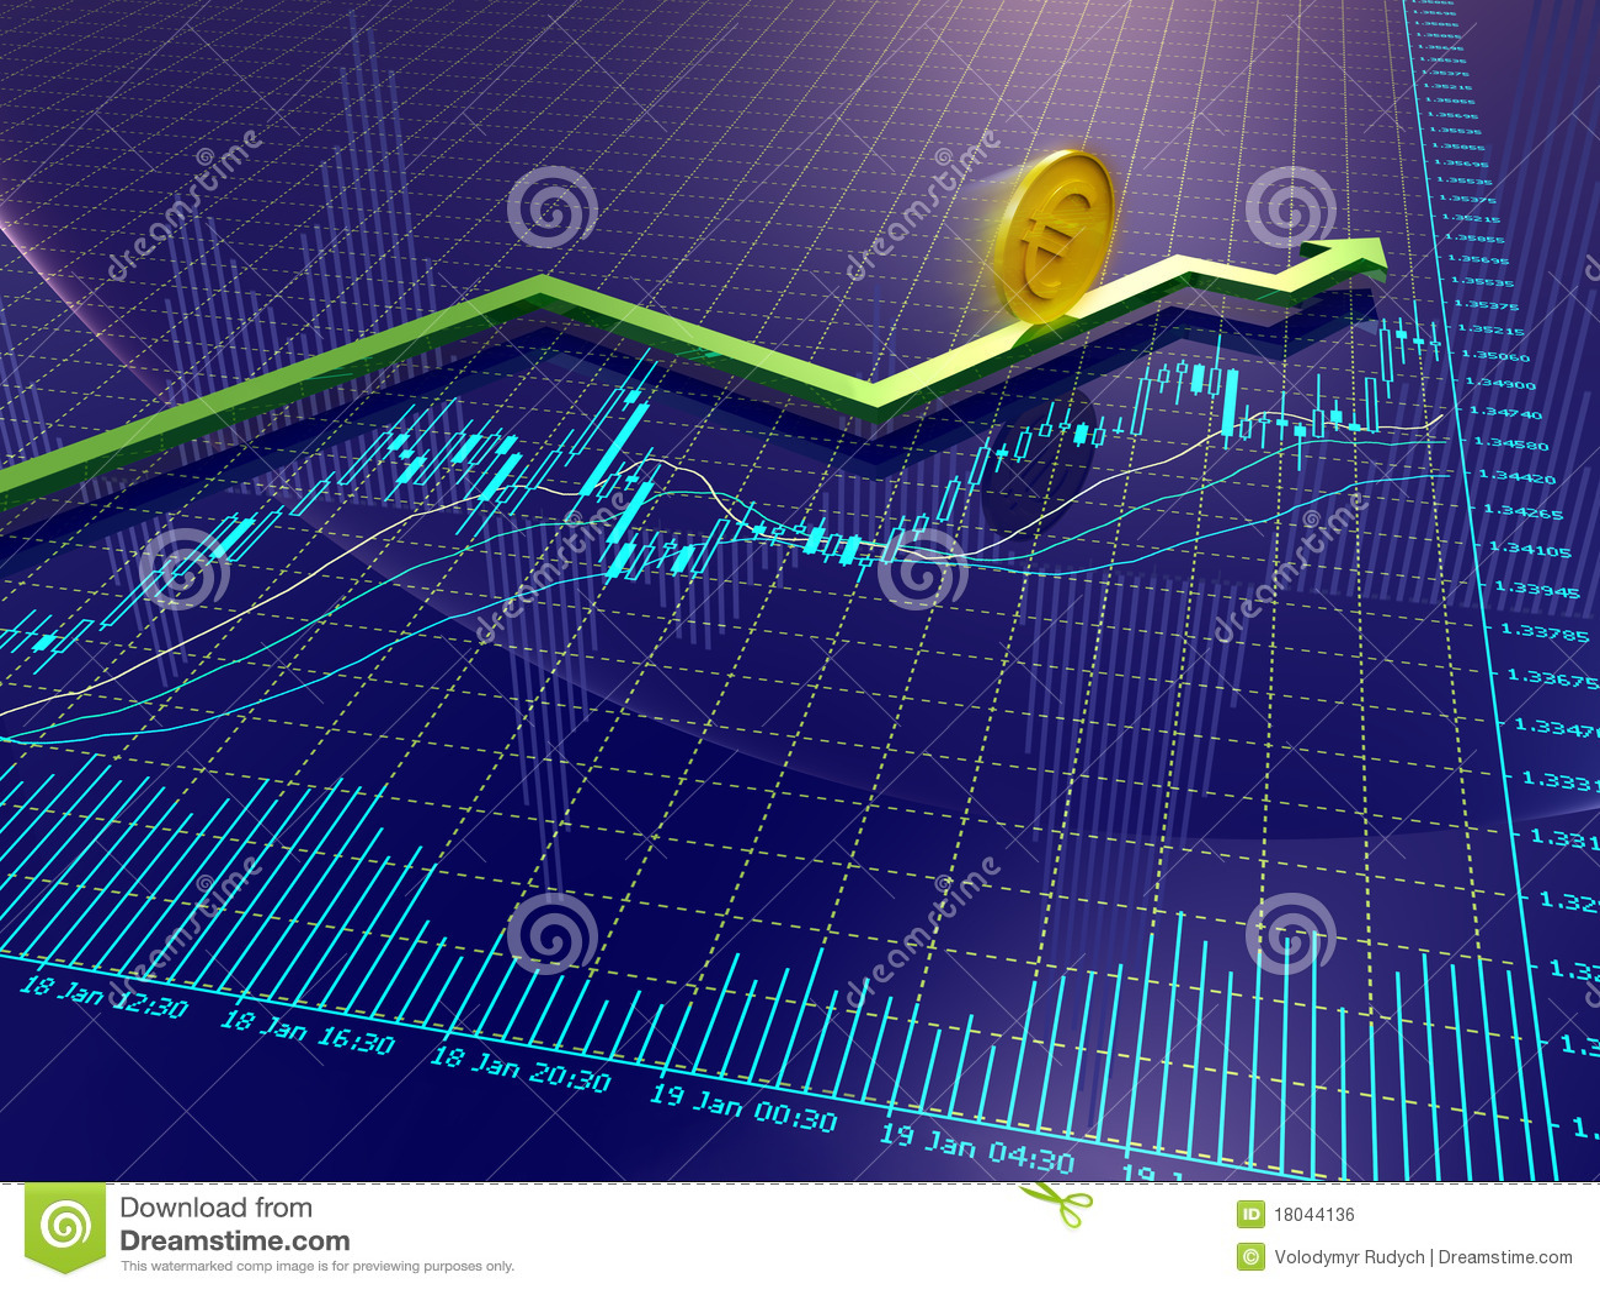 стрелка составляет схему валютам евро монетки